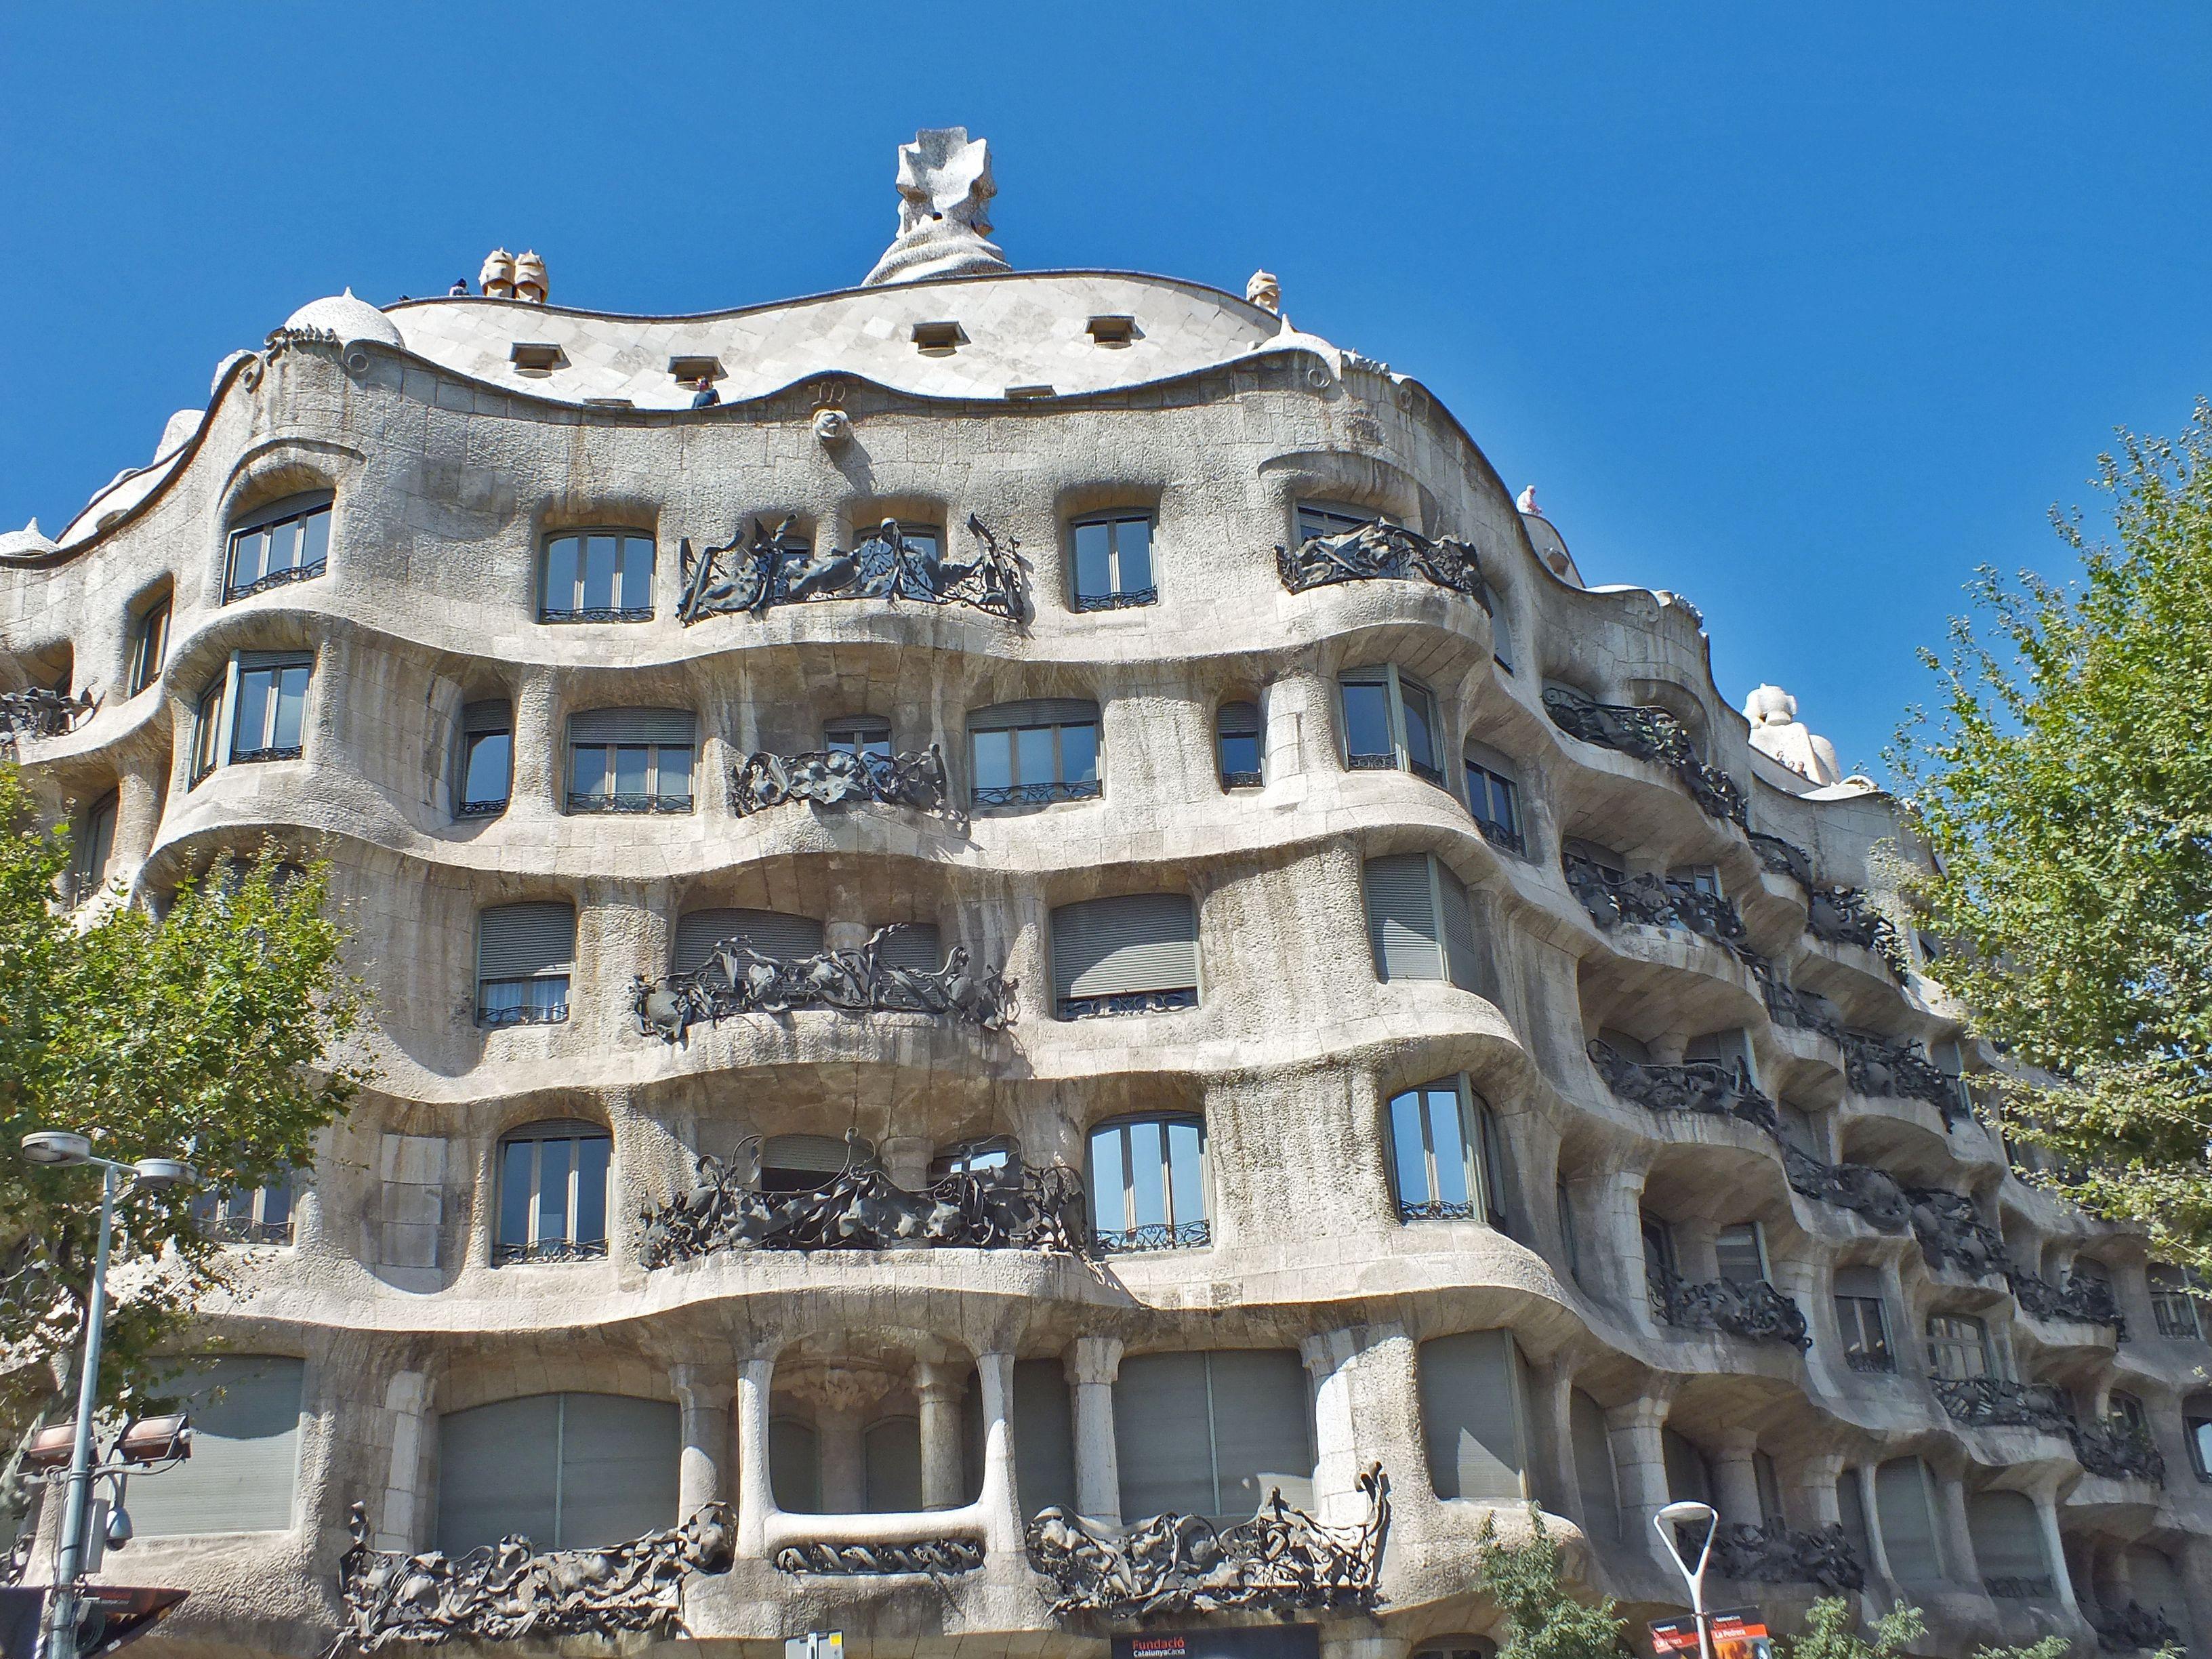 Curvy apartment building in Barcelona, Spain, the Casa Mila, by Antoni Gaudi